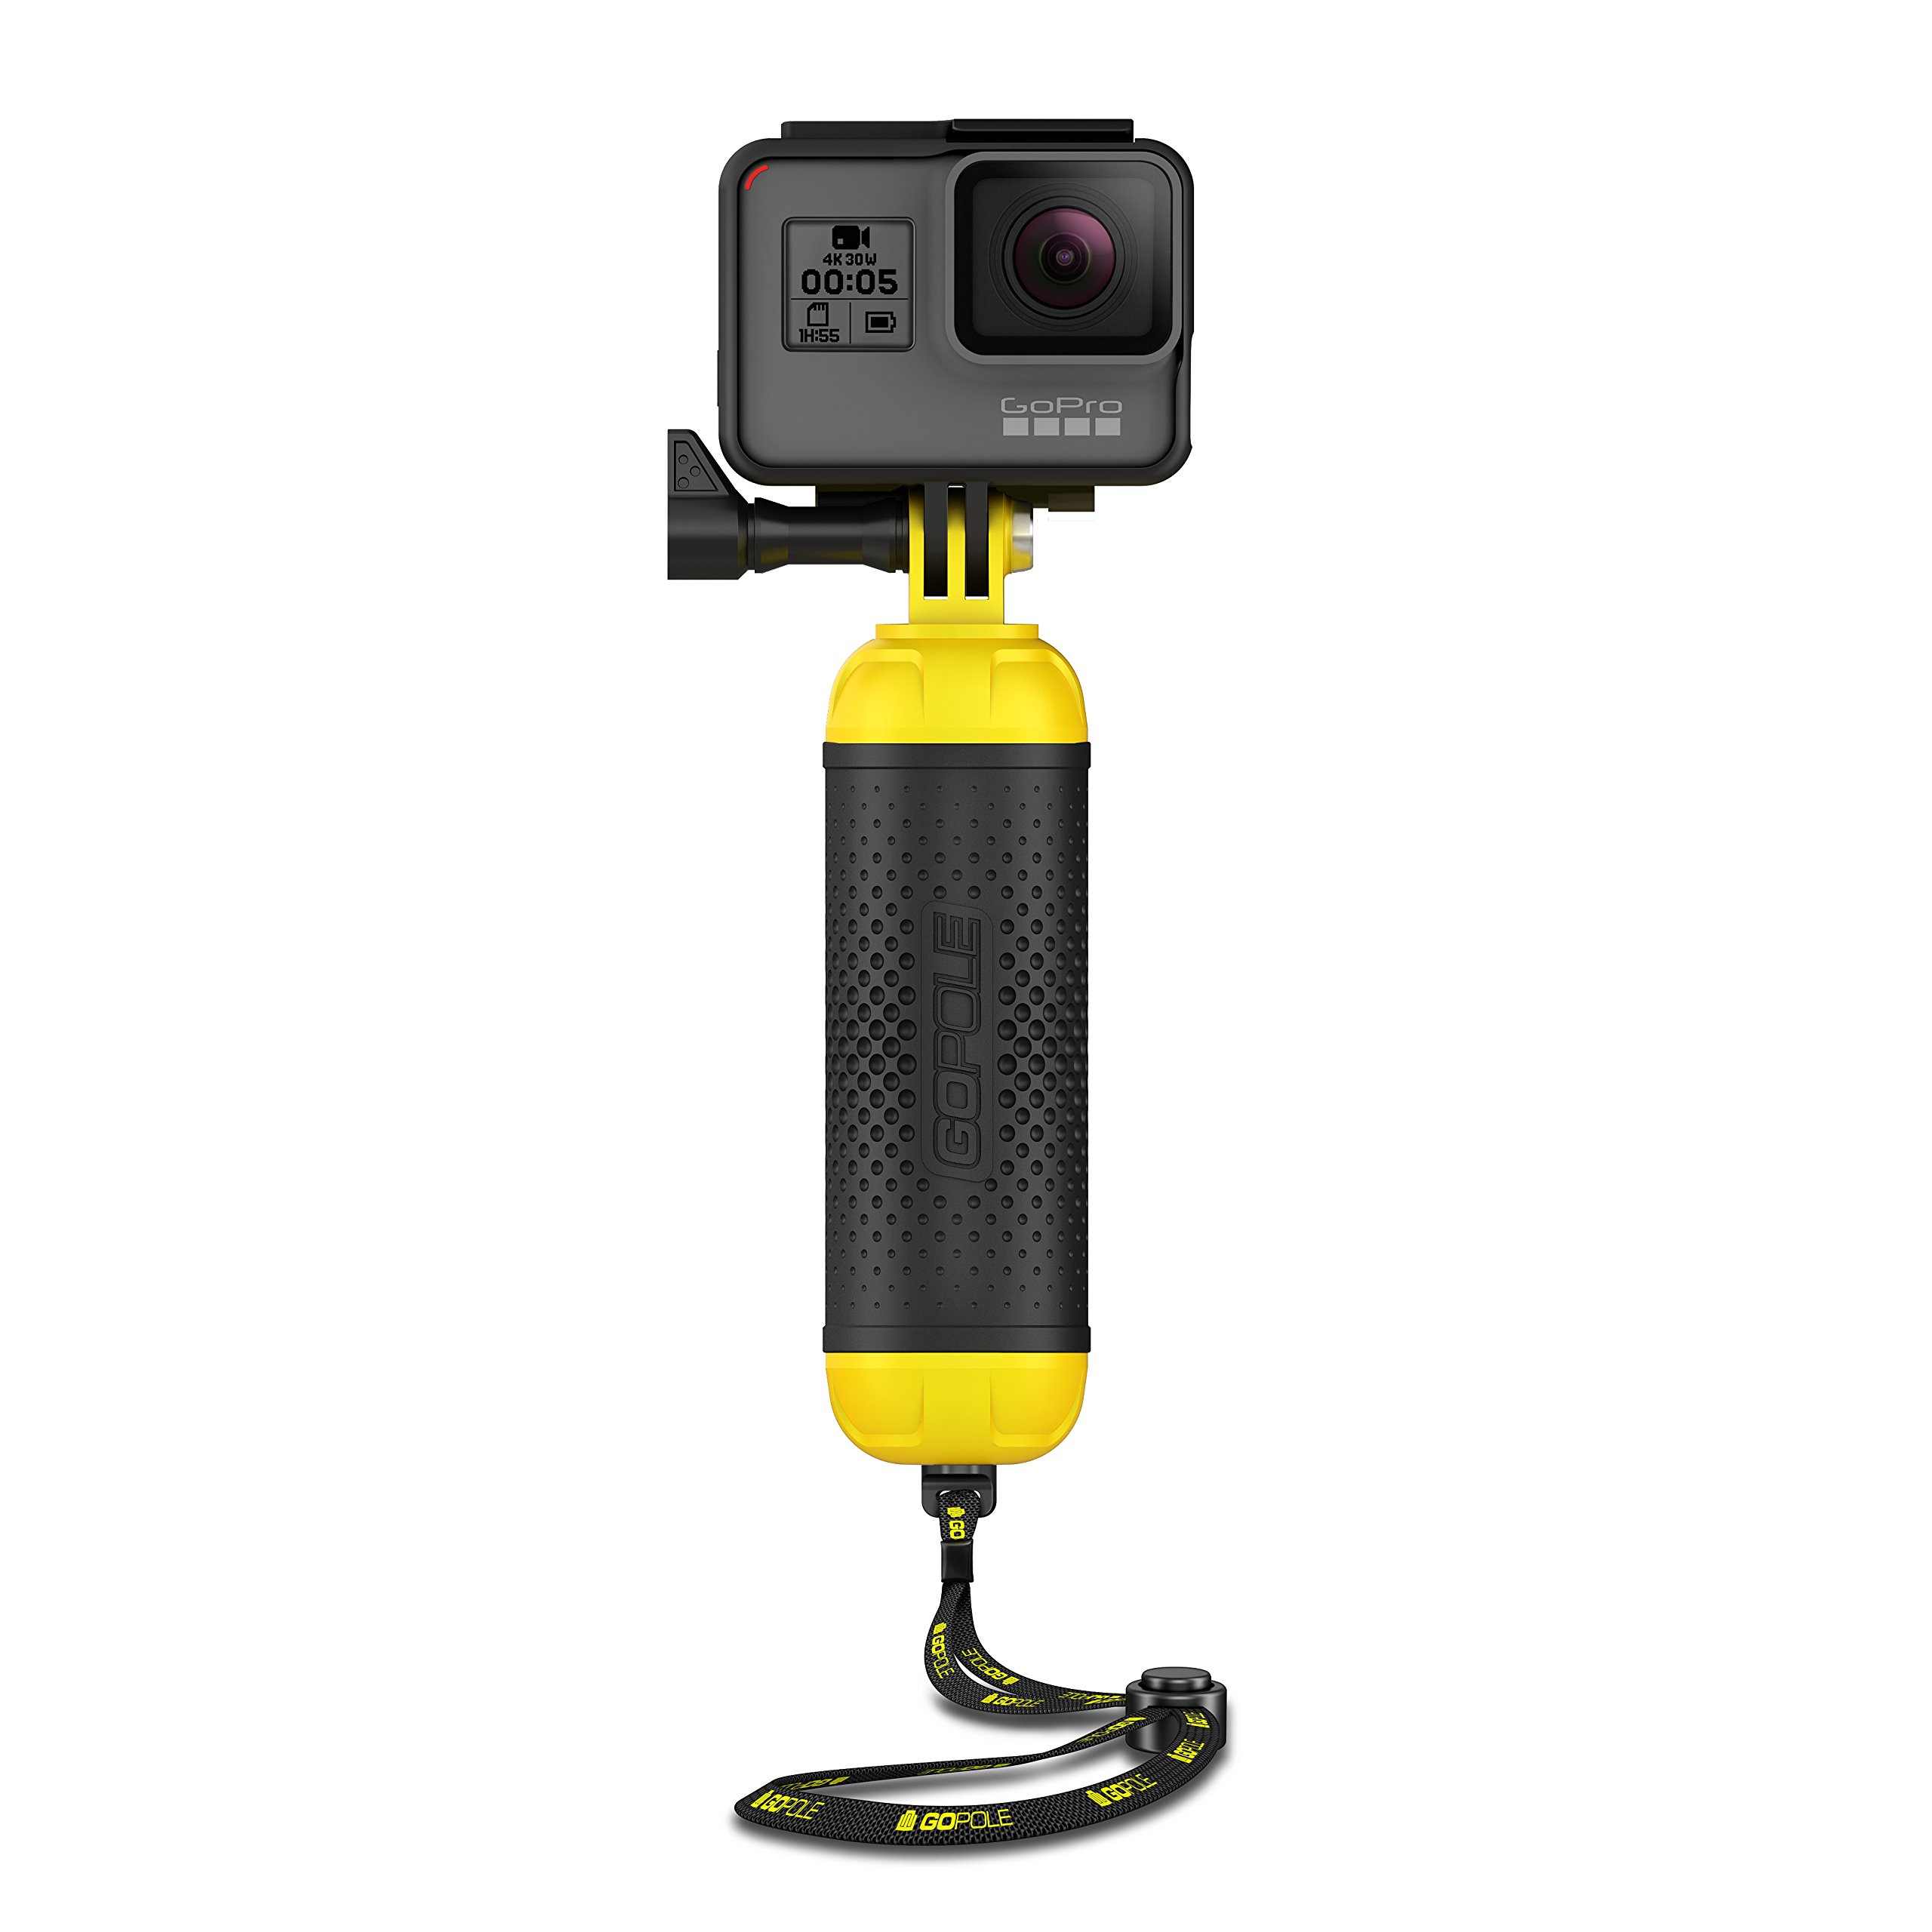 Bobber - Floating Hand Grip for GoPro HERO Cameras